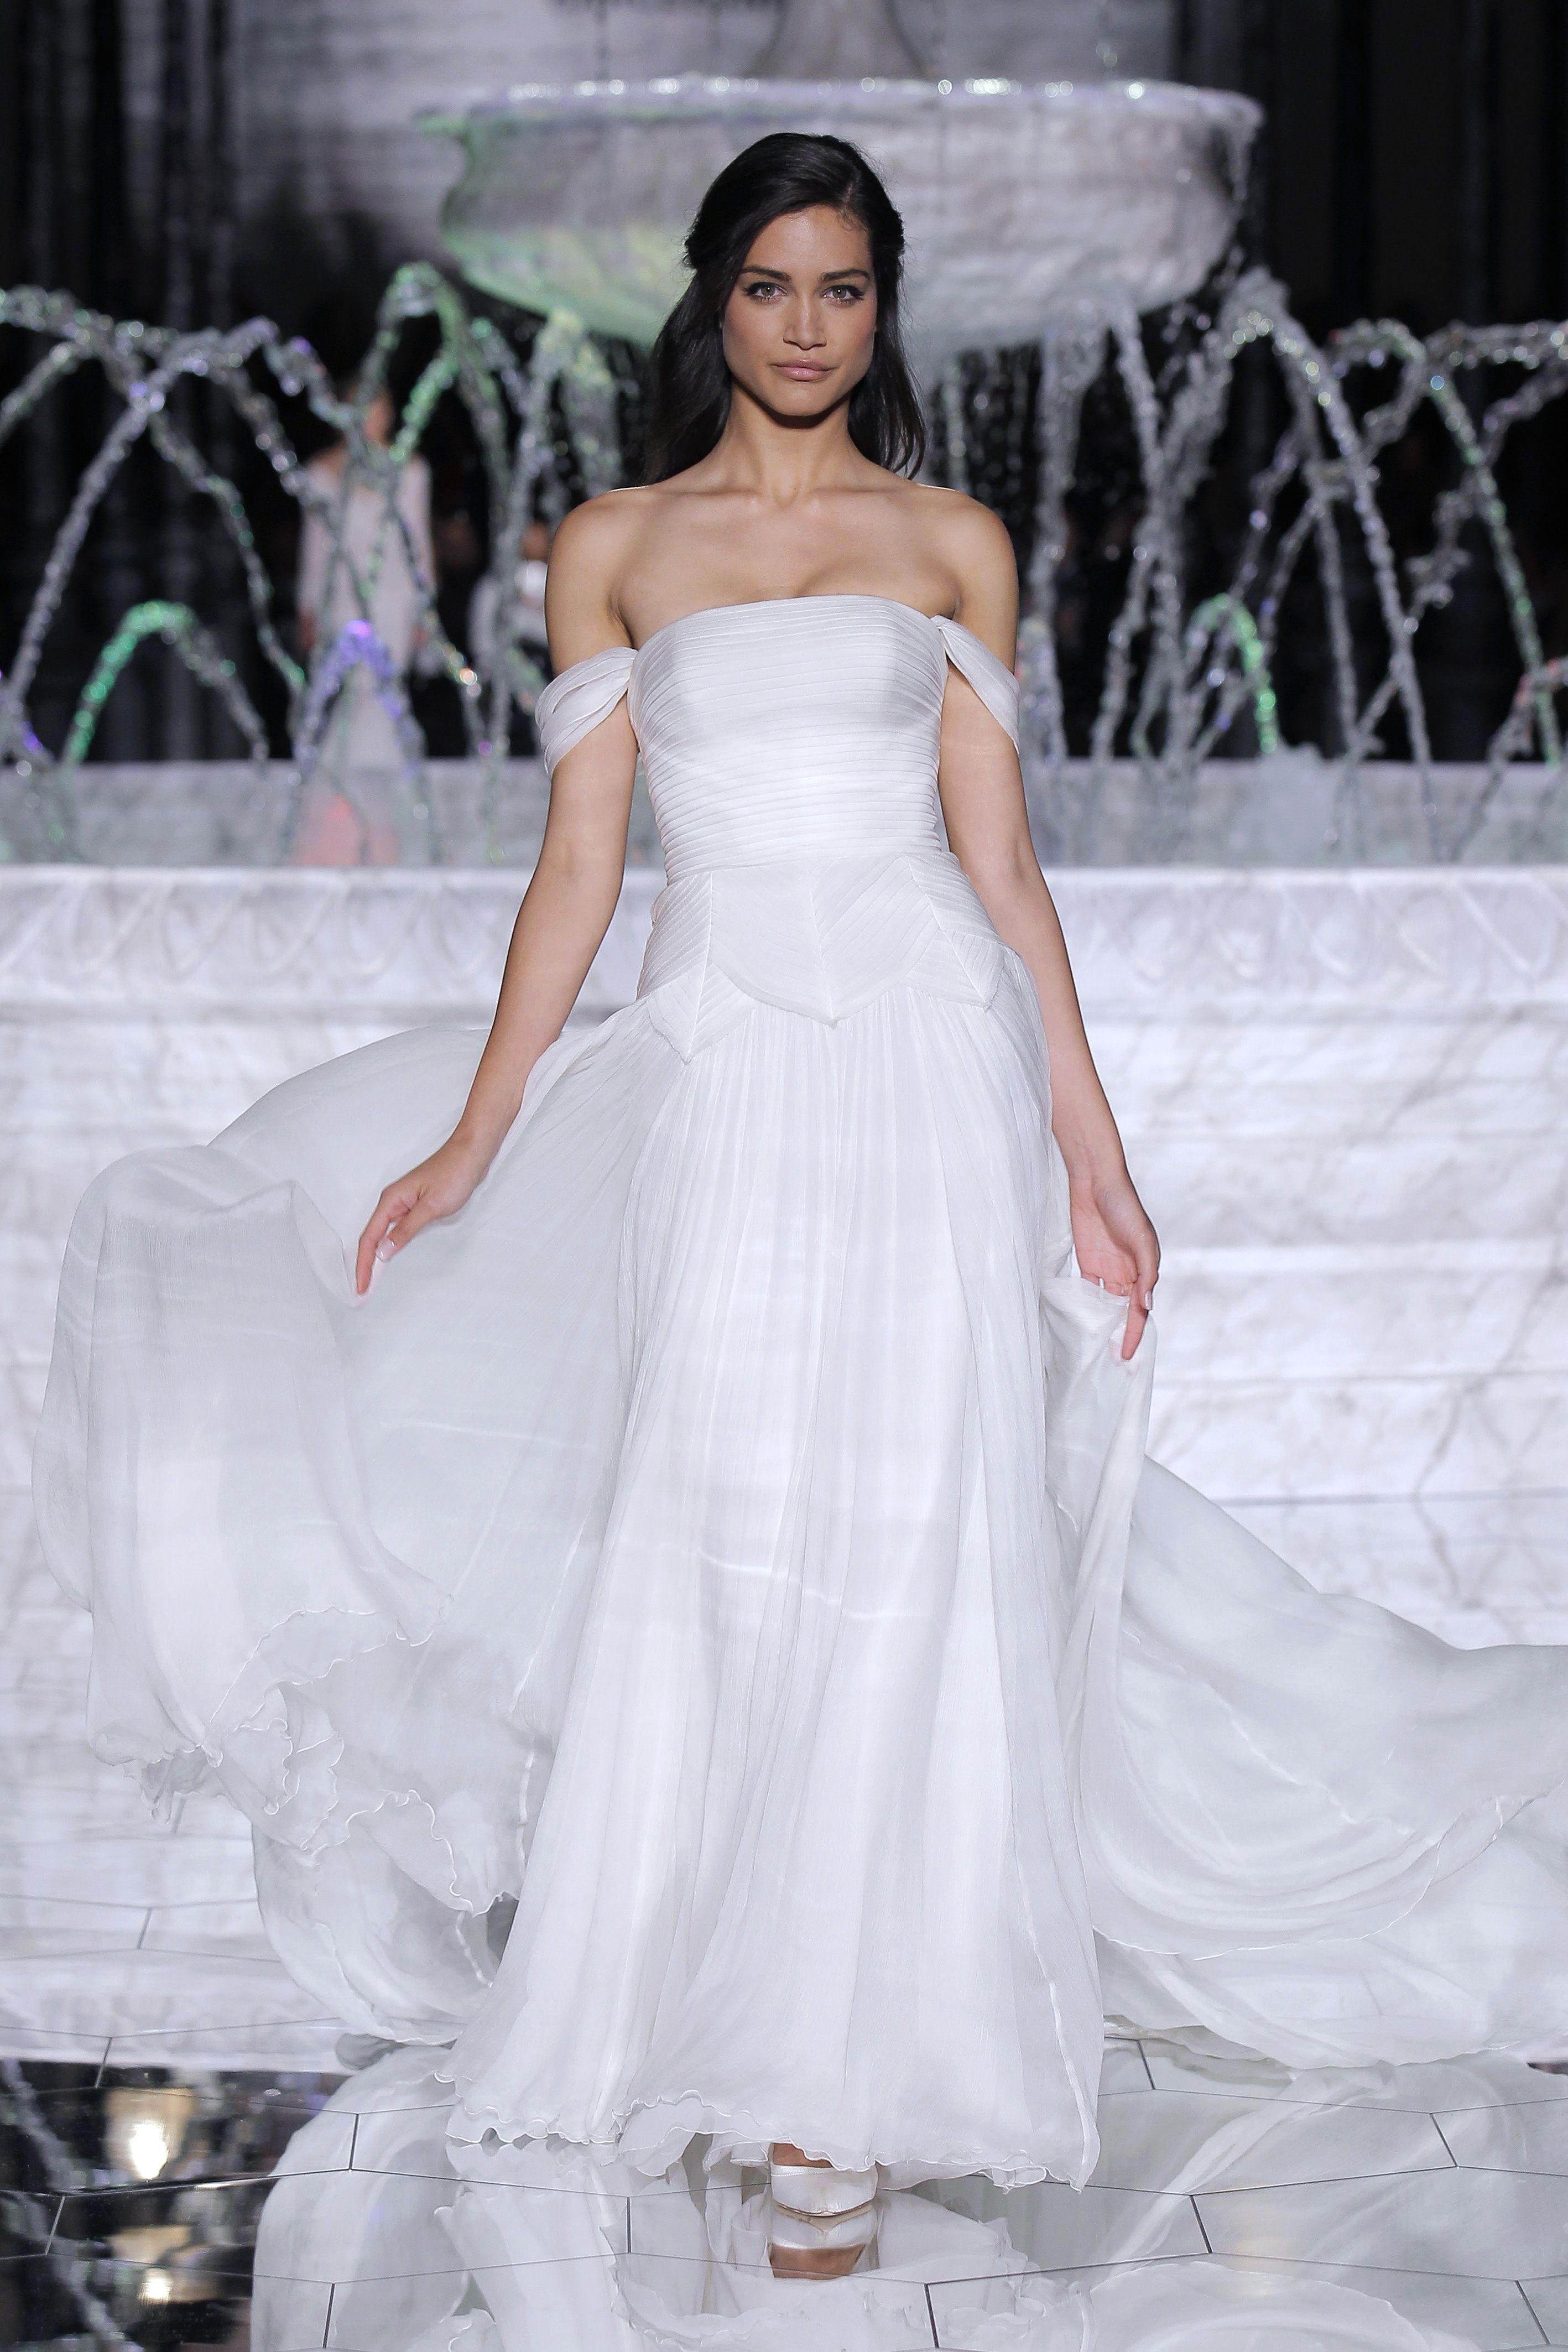 Pin by tina fernandes on wedding inspirations pinterest wedding